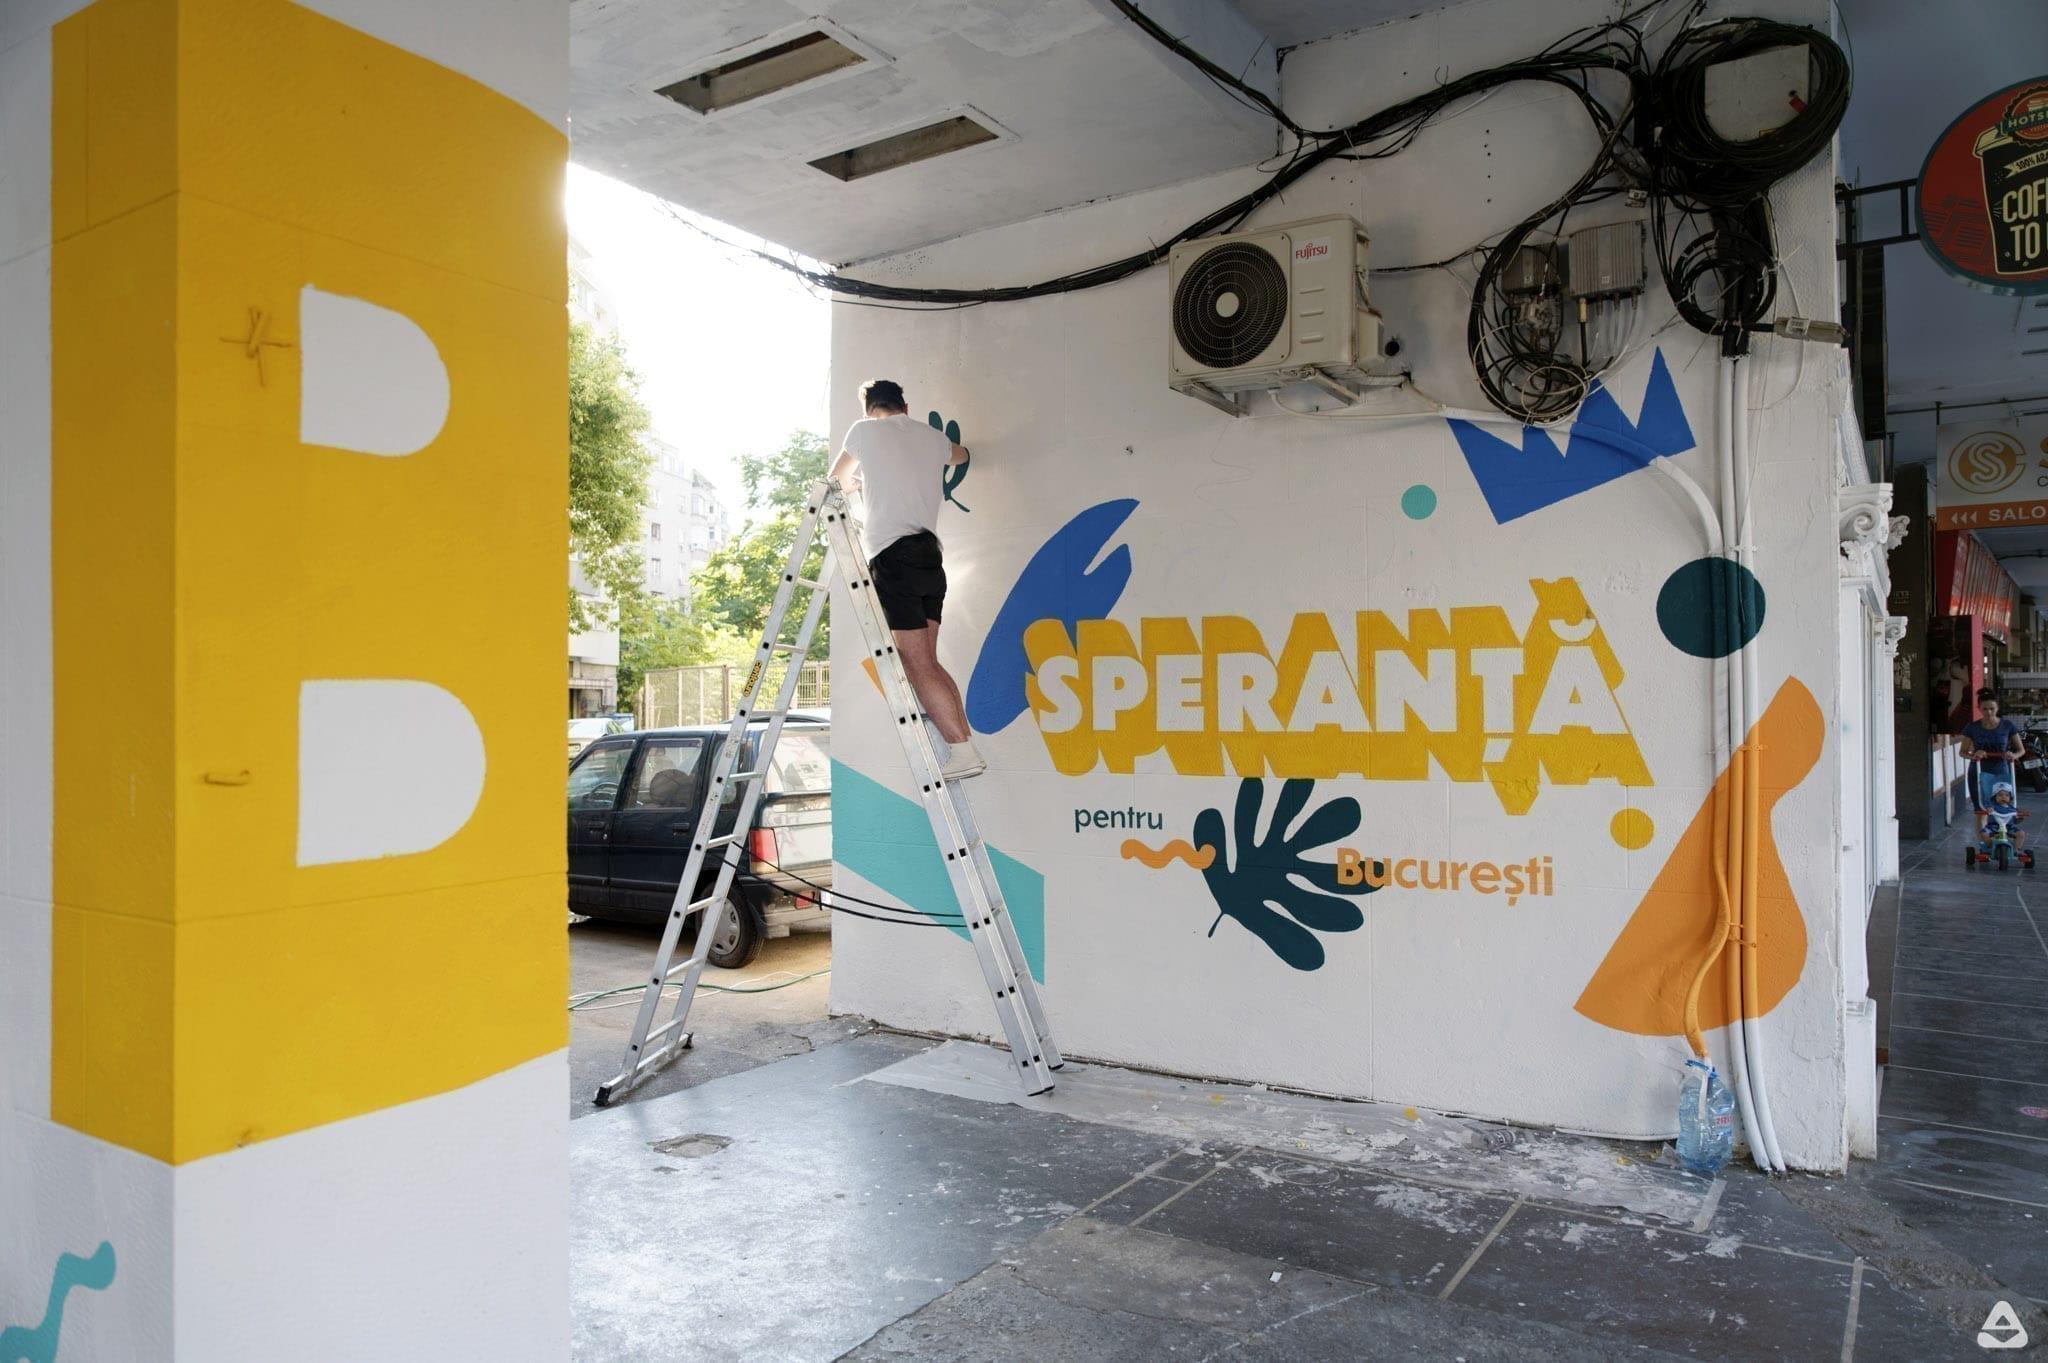 TypeThursday București - Hope for Bucharest with Bianca, Artemisa & co